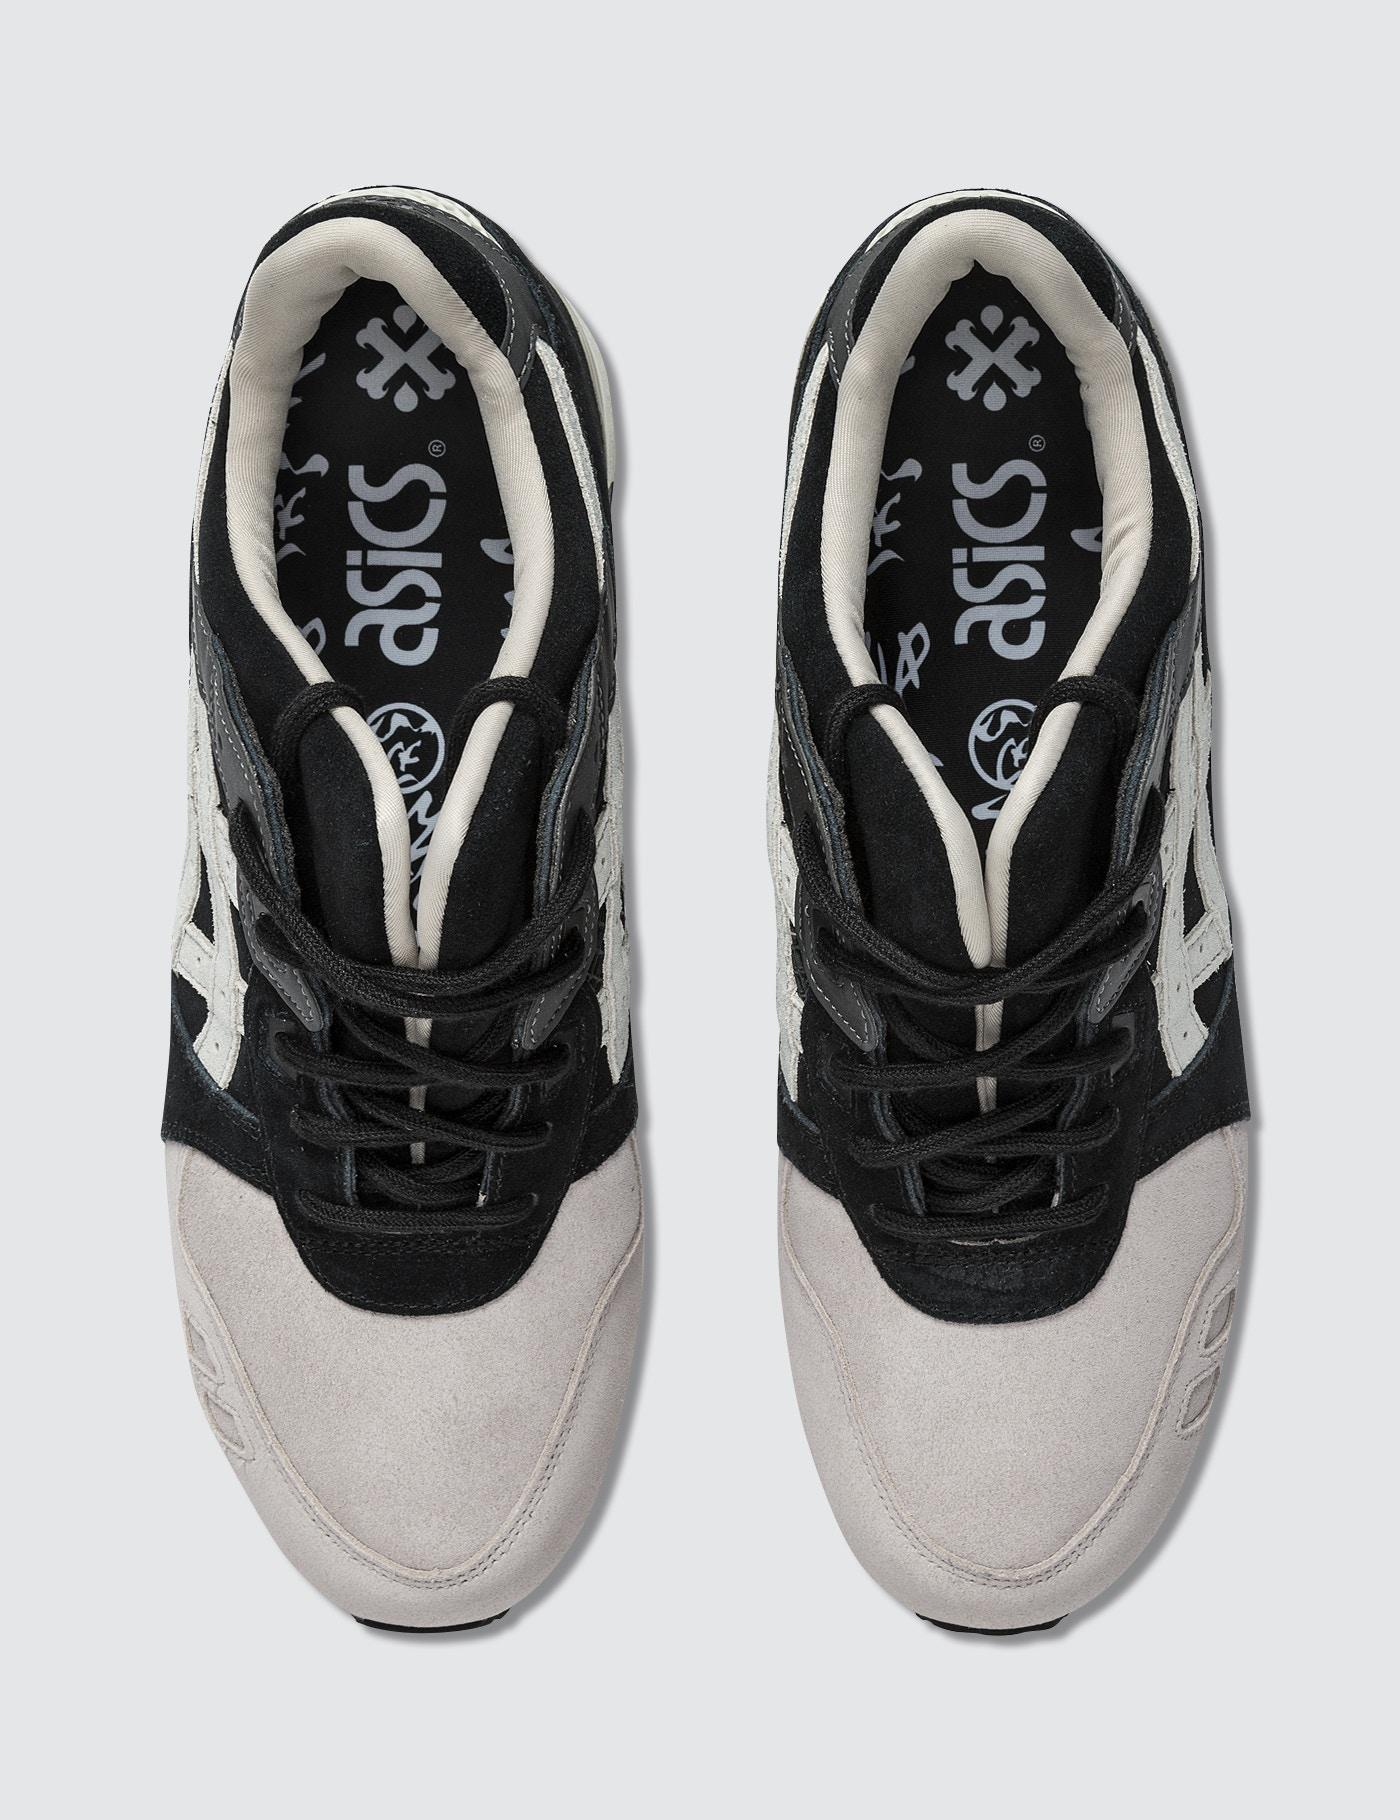 quality design aad1e 313b3 Asics Black Kicks Lab X Tiger Gel-lyte Iii for men